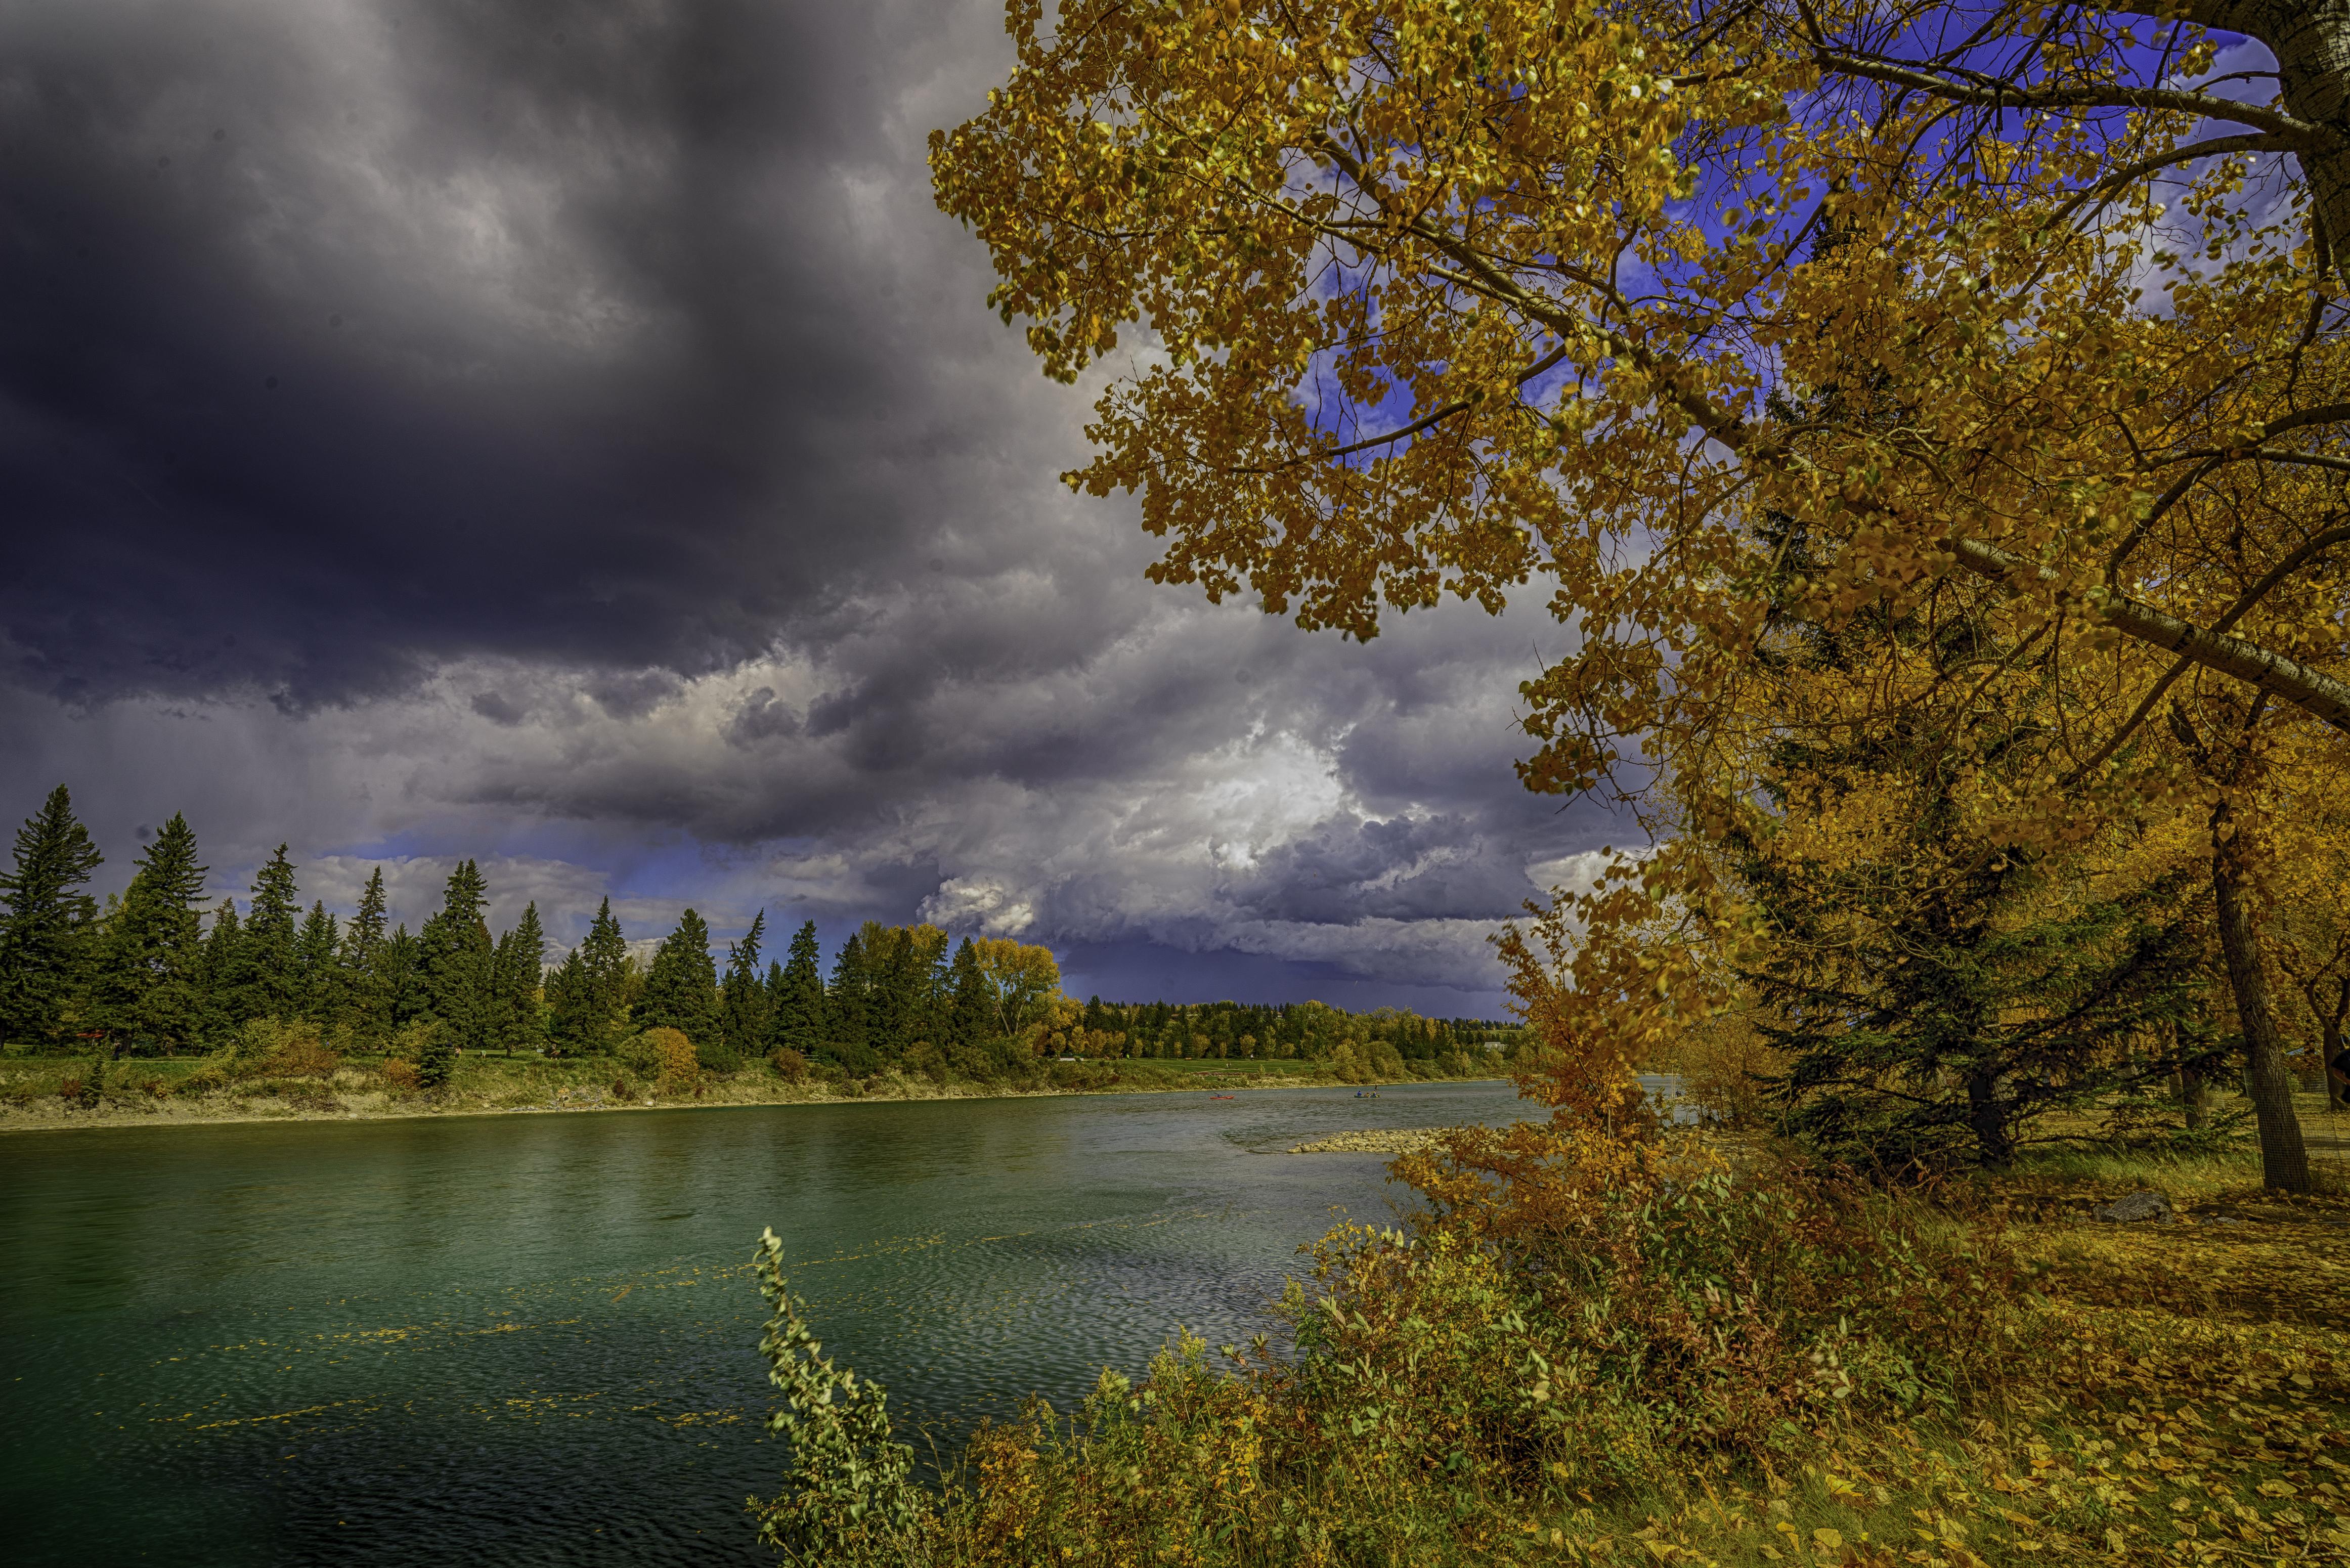 Bow River, Calgary, Alberta, Canada